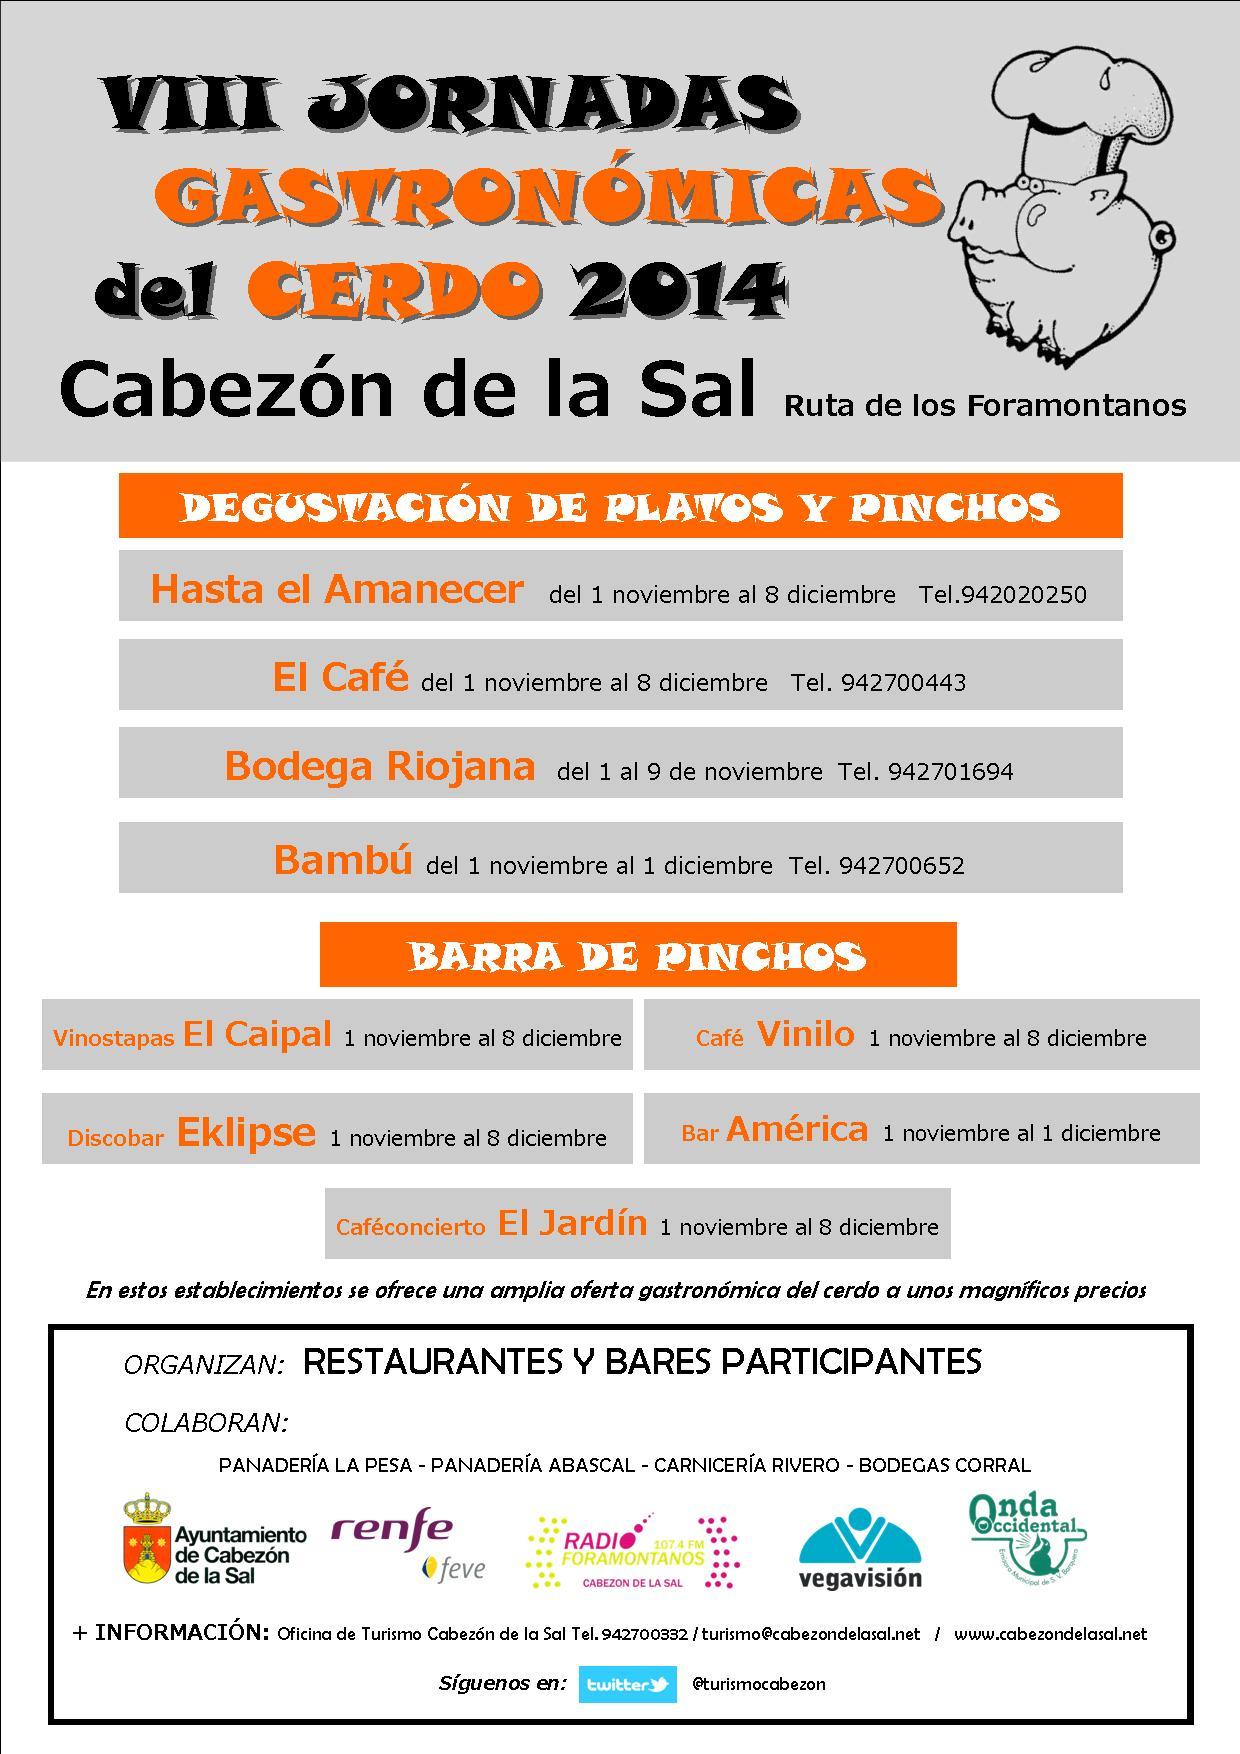 http://www.cabezondelasal.net/wp-content/uploads/2014/10/FERIA-DEL-CERDO-mano-restaurantes1.jpg